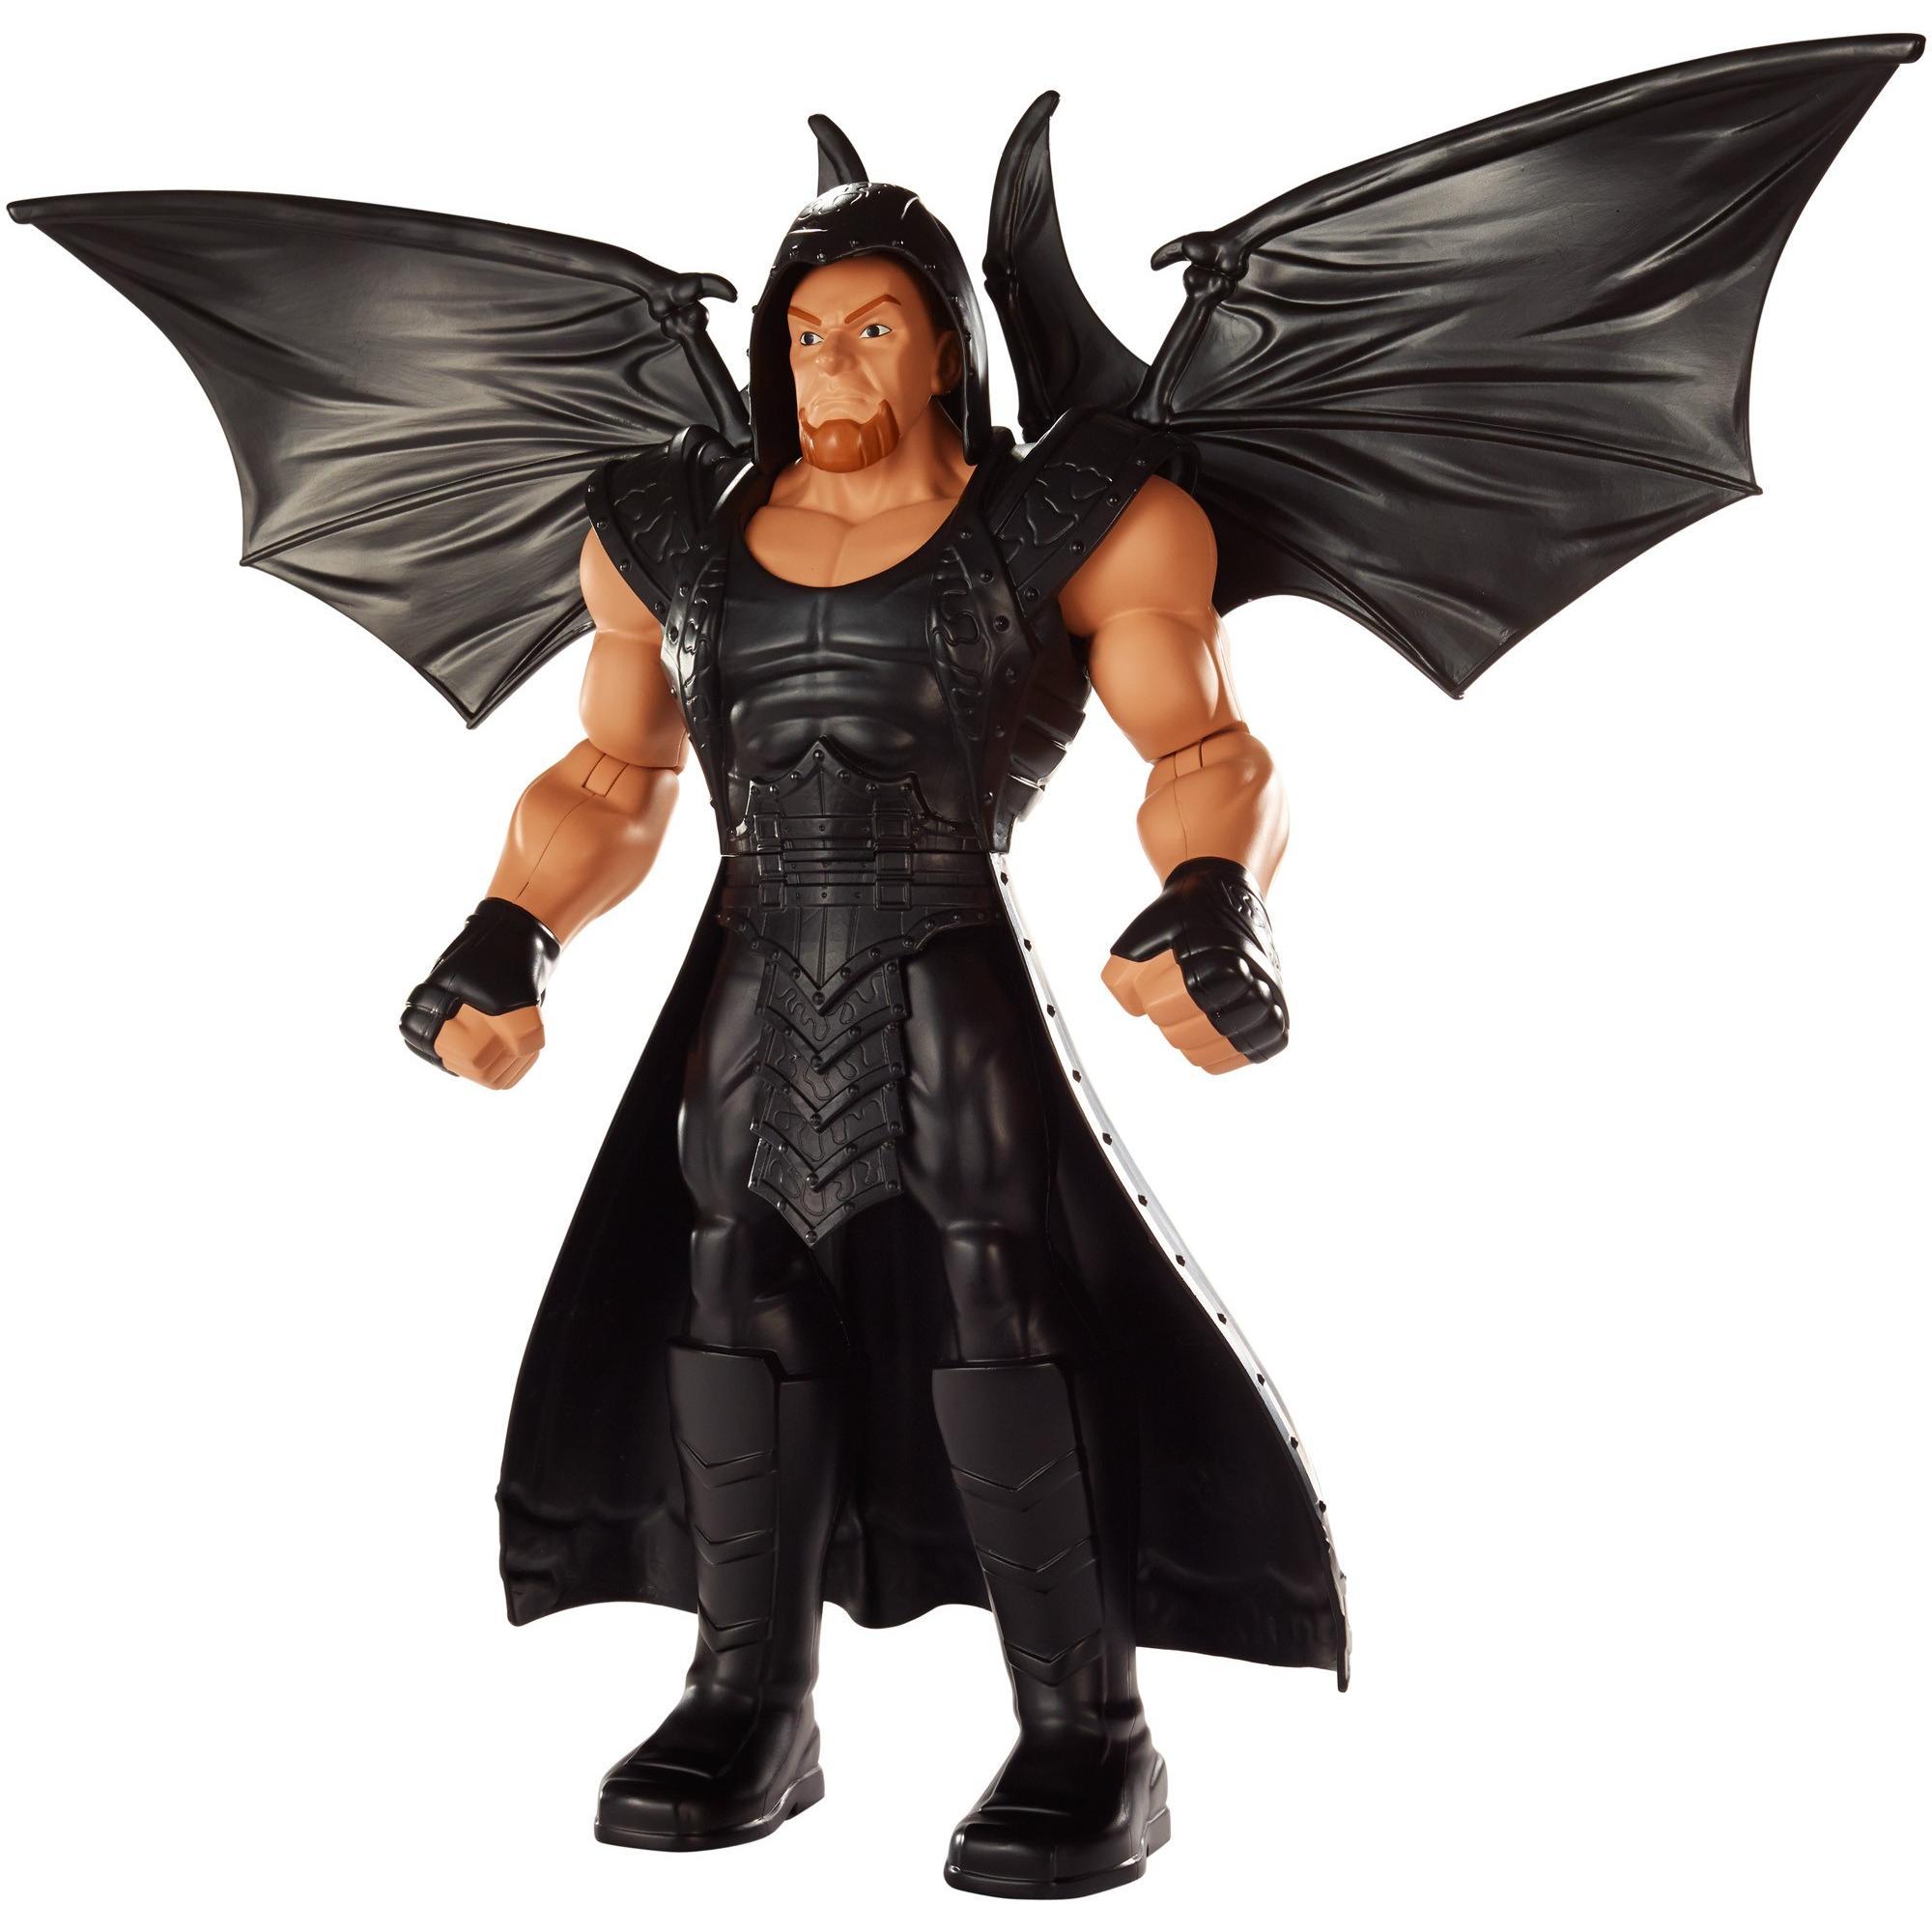 WWE Undertaker Large Figure